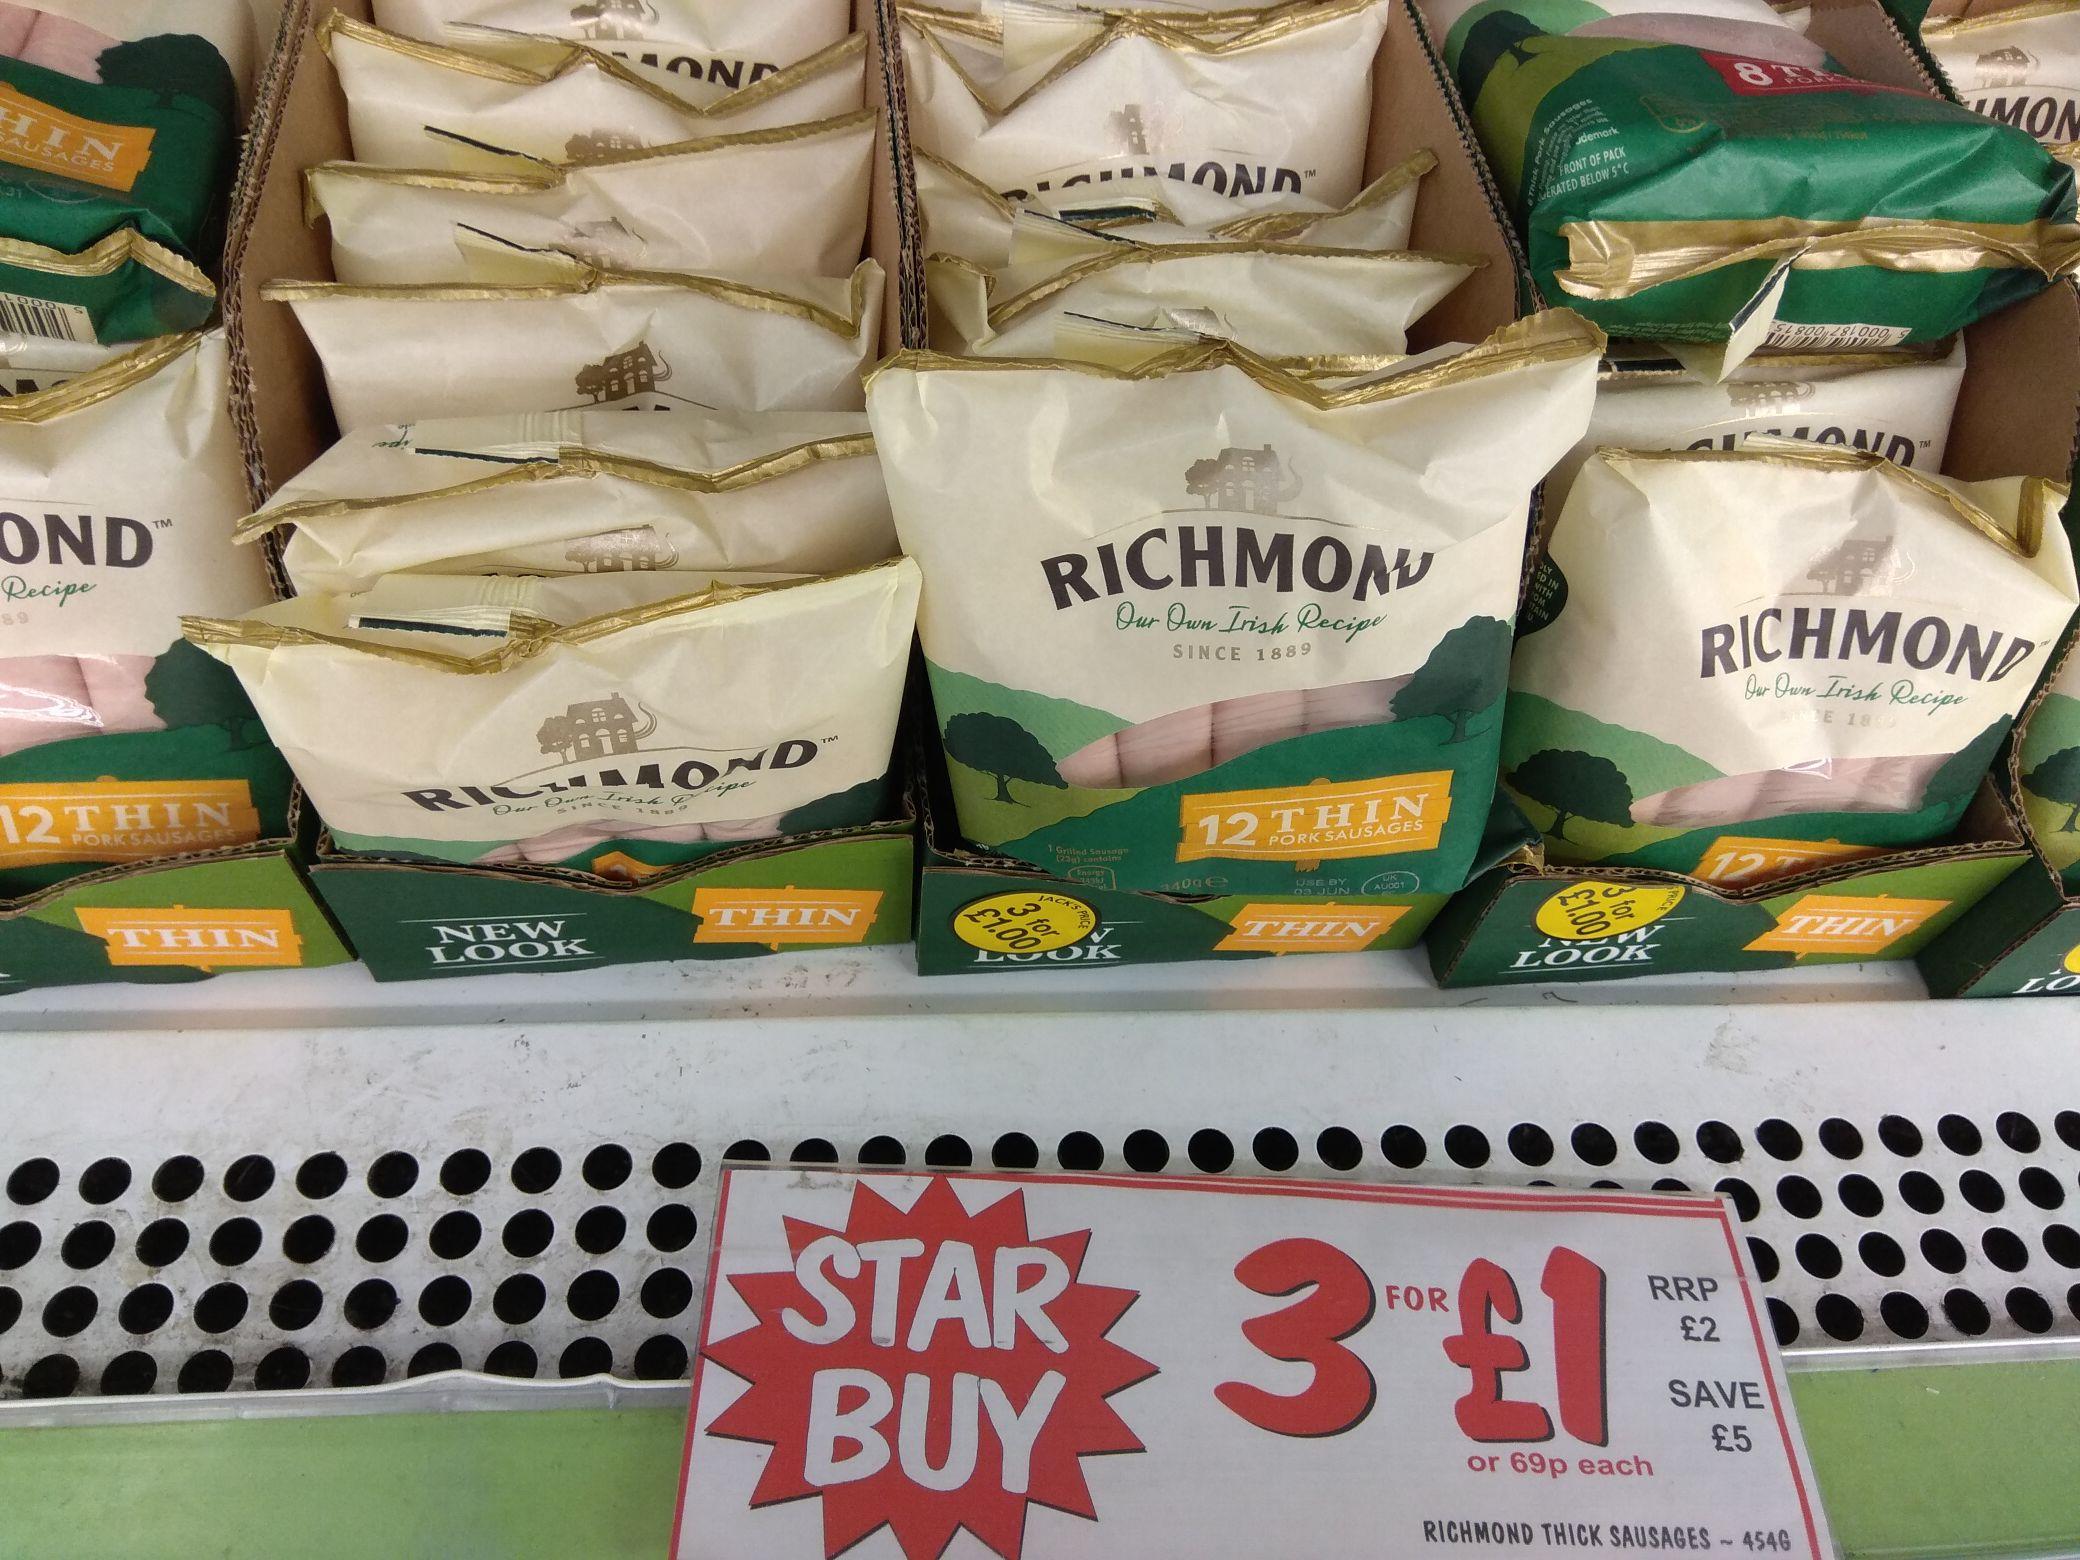 3 x Richmond Thin Sausages (12 packs) 454g - £1 @ Fulton Foods